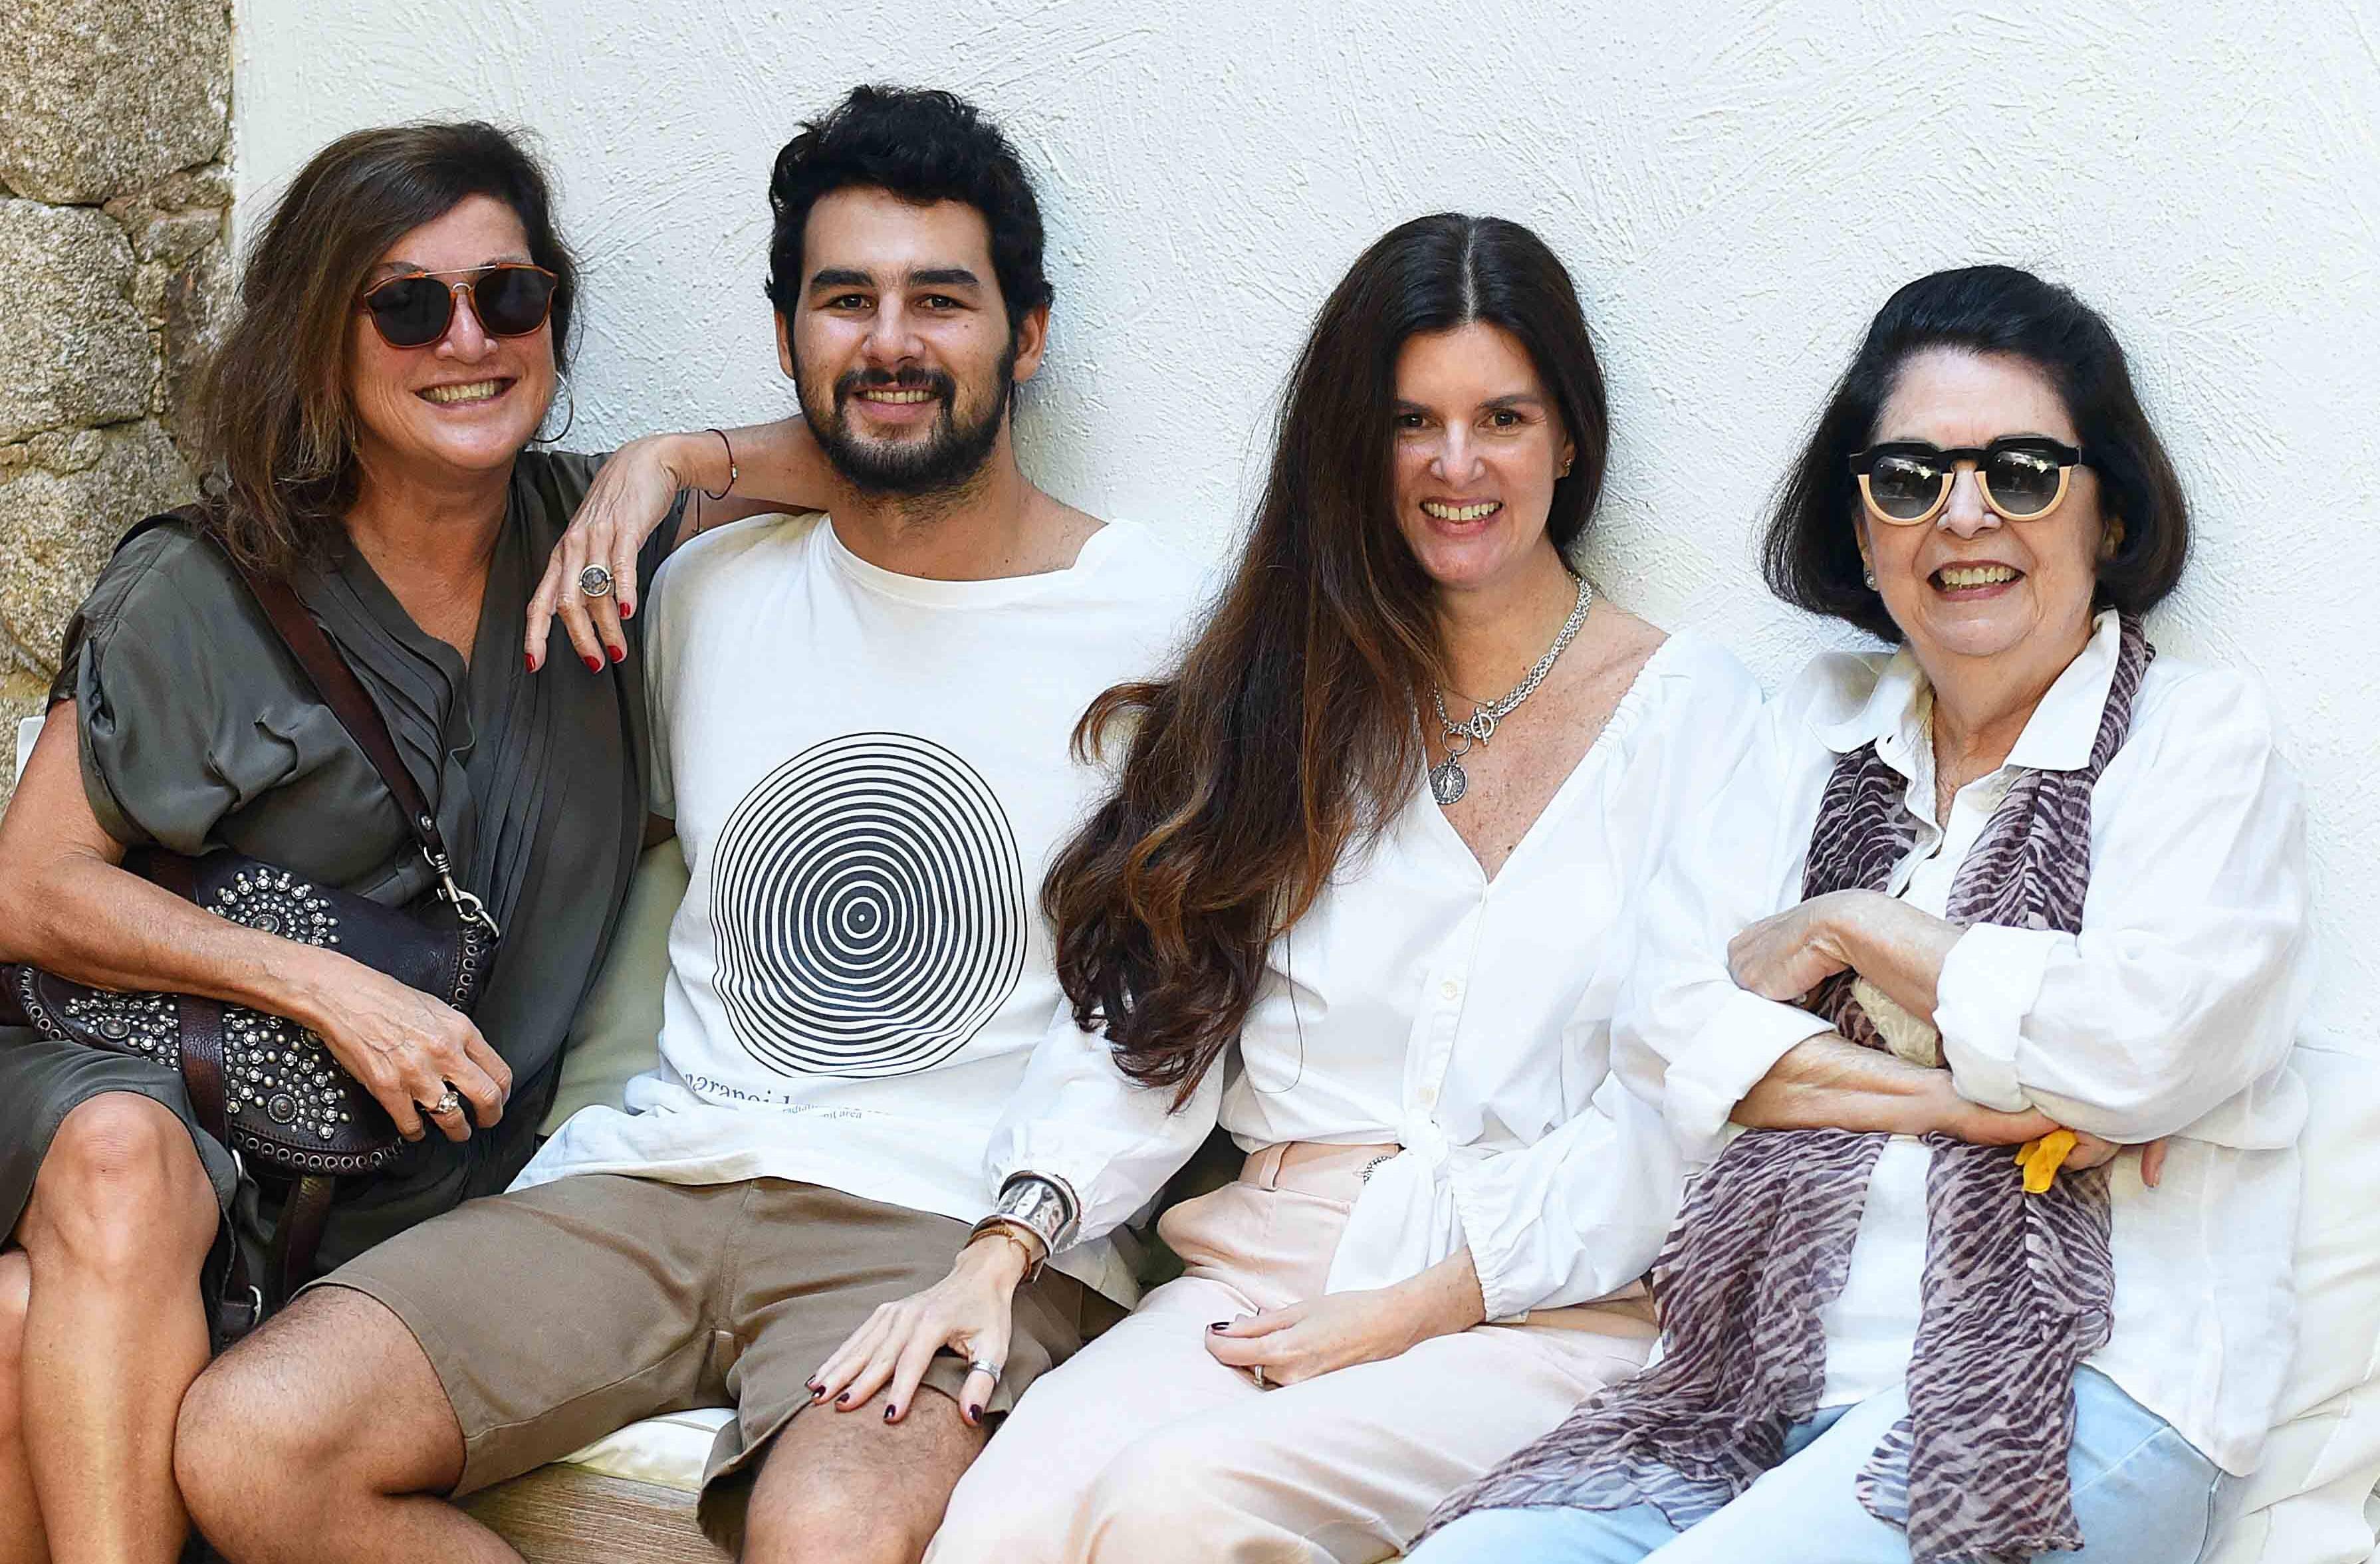 Andrea Prado, Thomaz Prado, Manuela Noronha e Suzete Aché /Foto: Ari Kaye